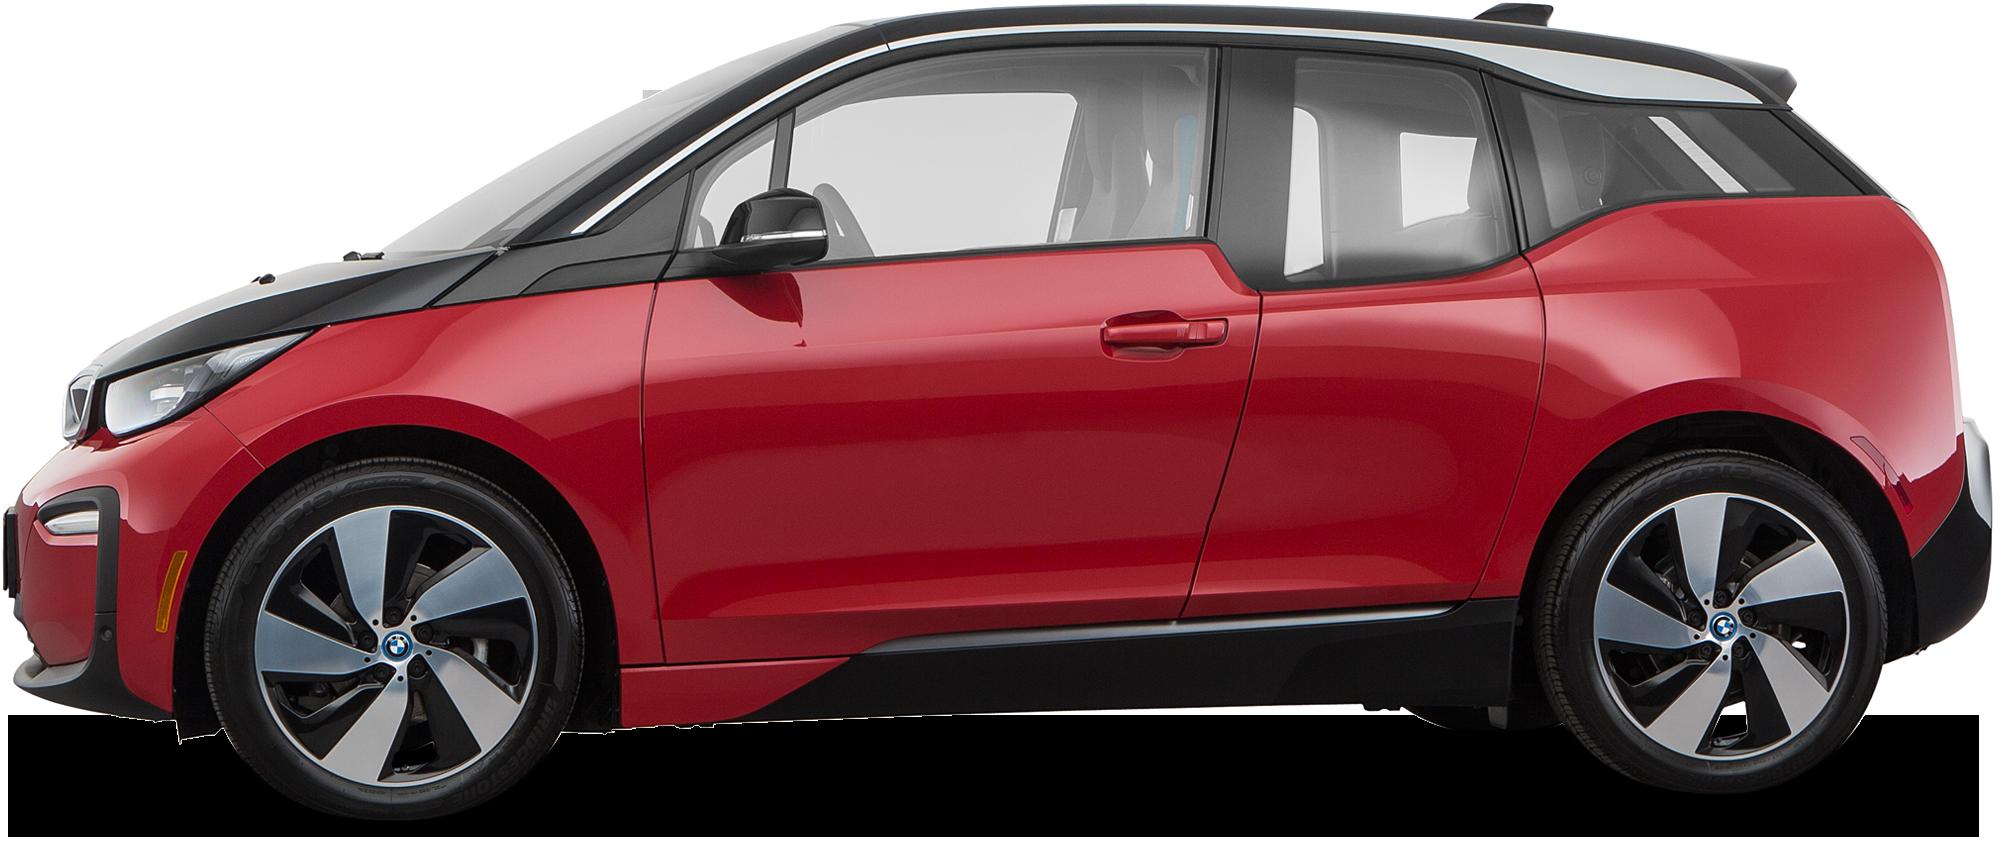 2019 BMW i3 Sedan 120Ah